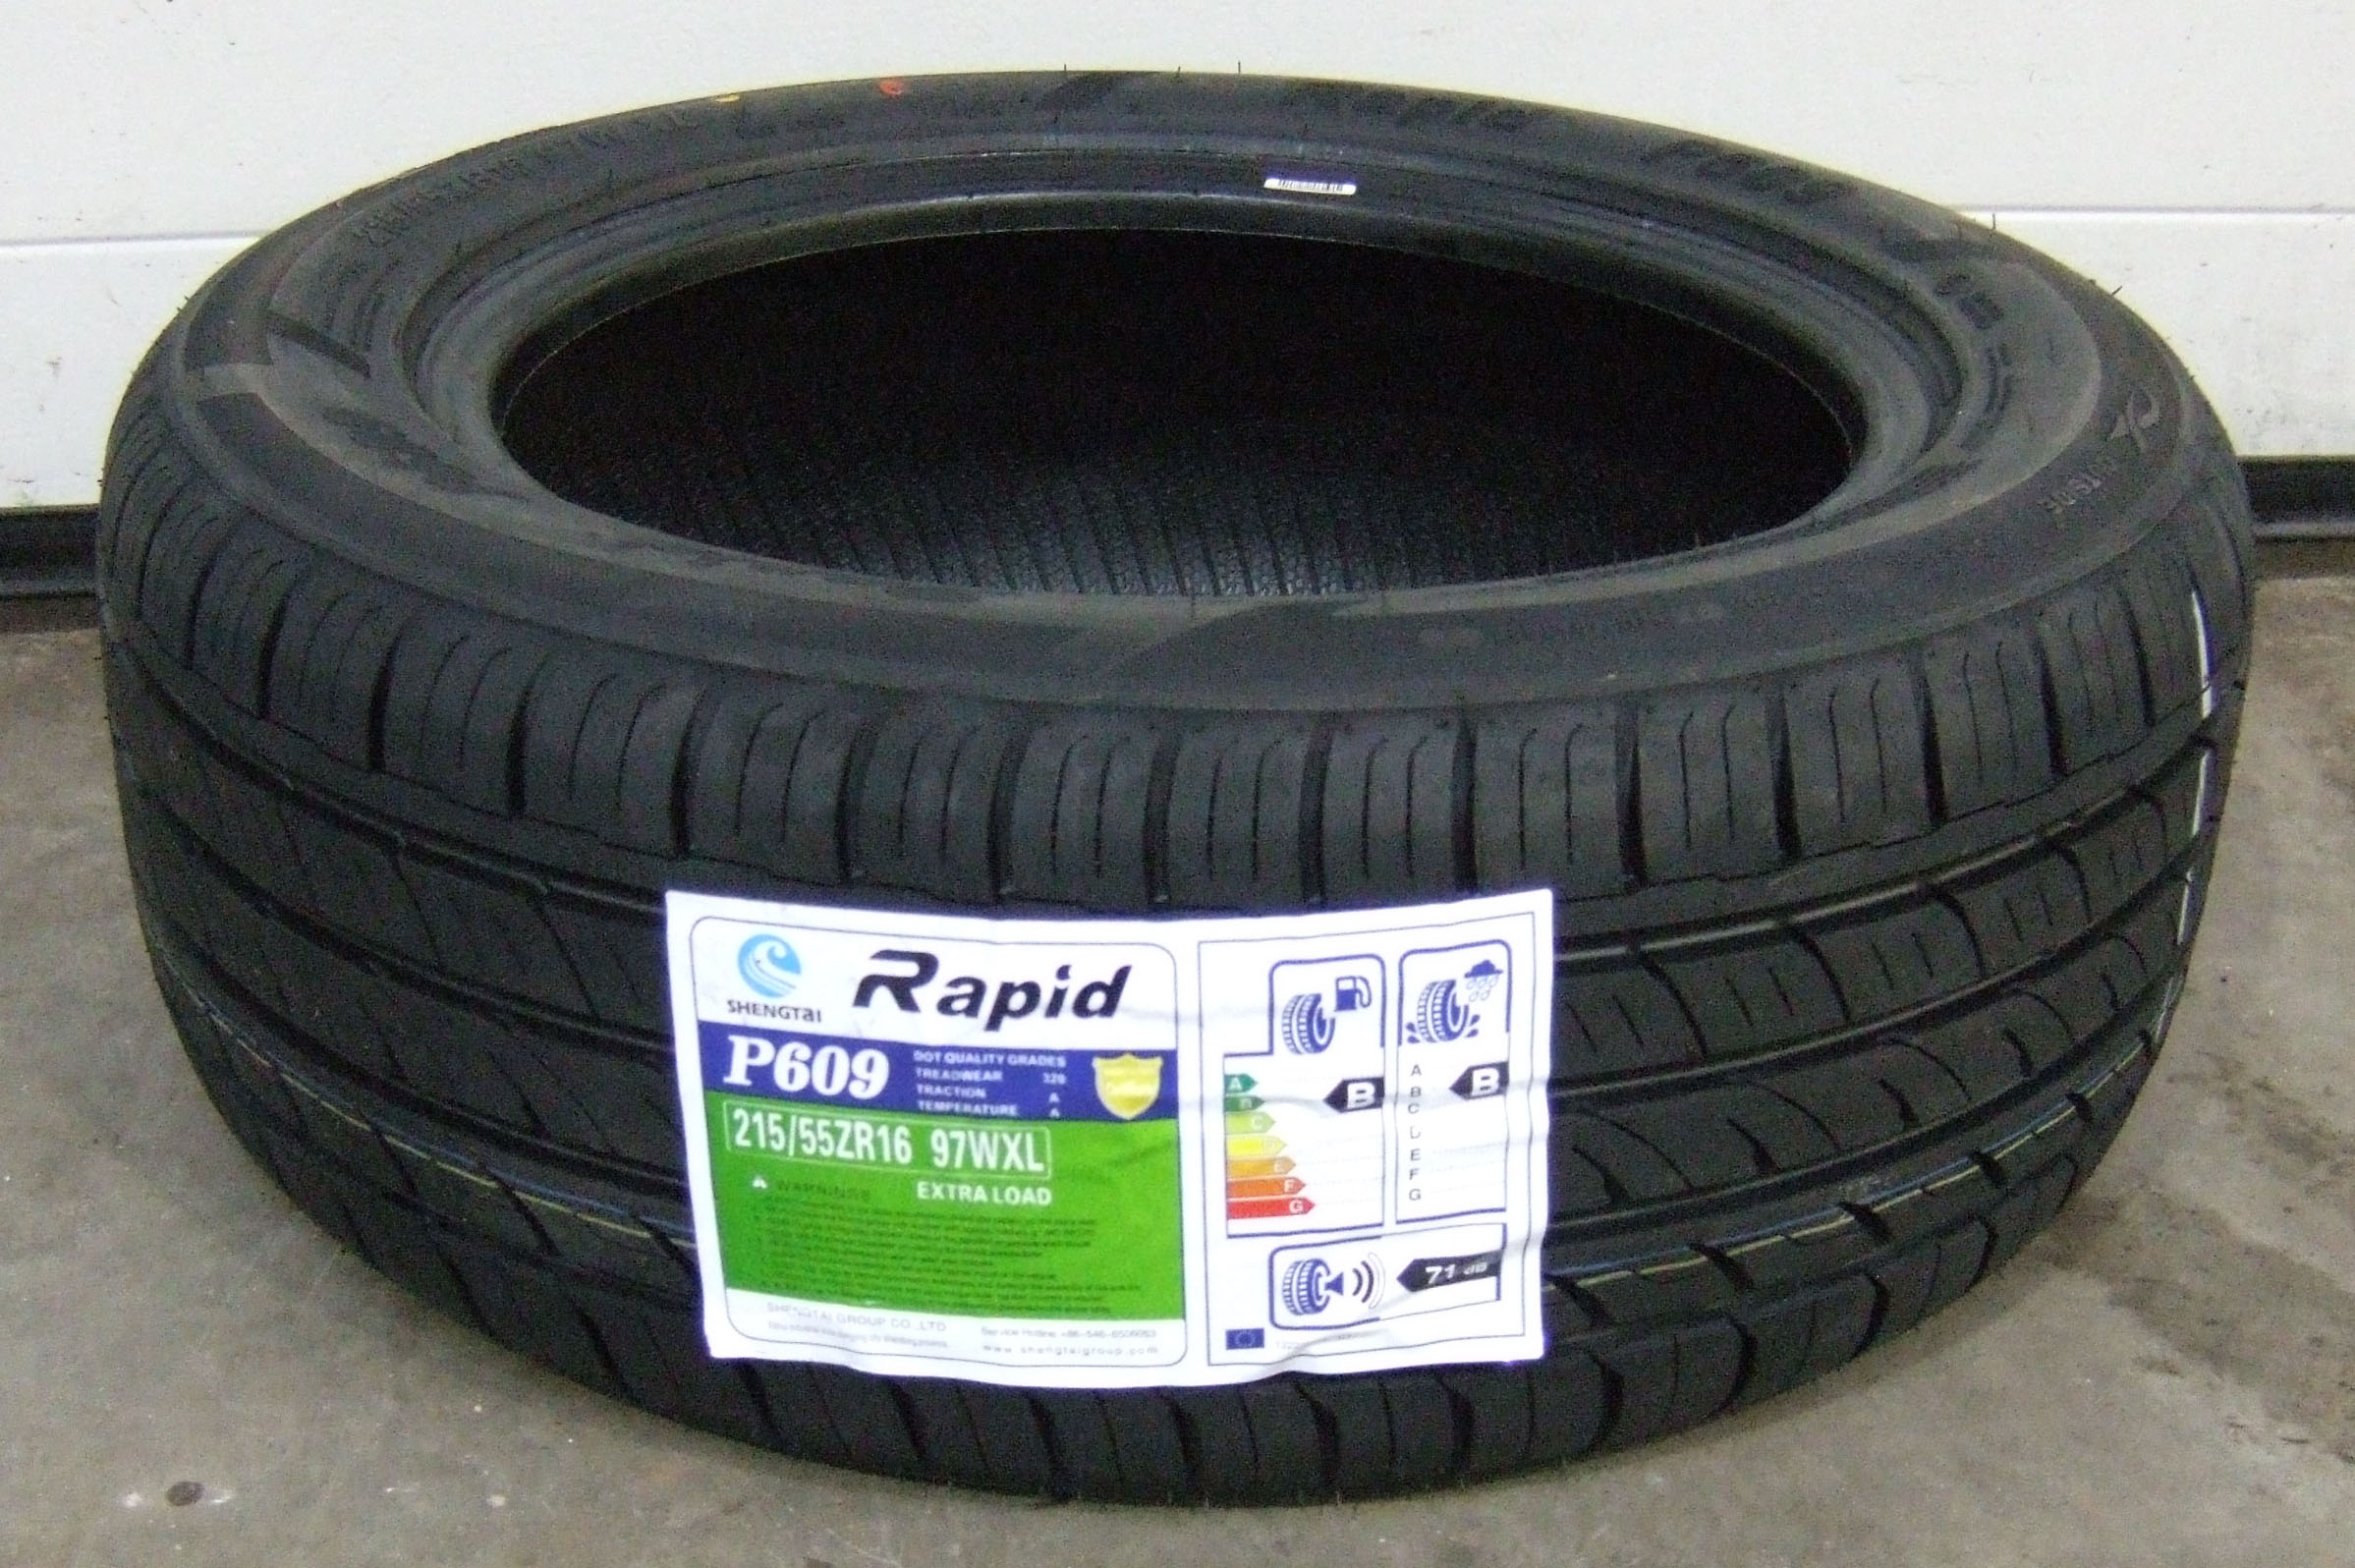 215 55 16 rapid p609 premium budget tyres 2155516 97w 215 55 16 x1 ebay. Black Bedroom Furniture Sets. Home Design Ideas